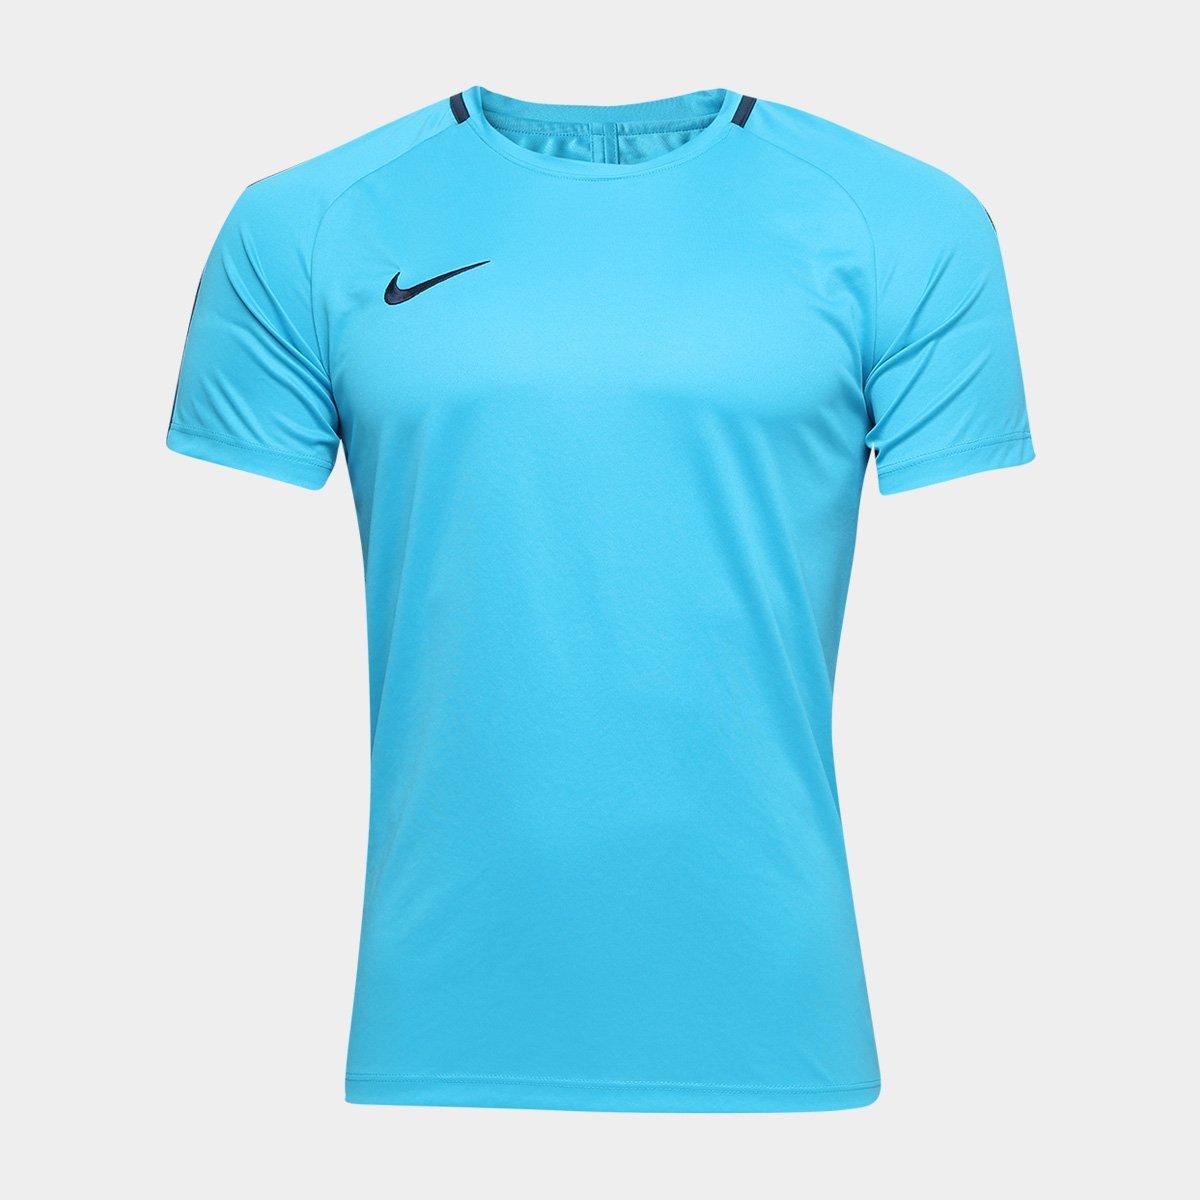 fc4f036b3f Camisa Nike Academy Masculina - Azul - Compre Agora